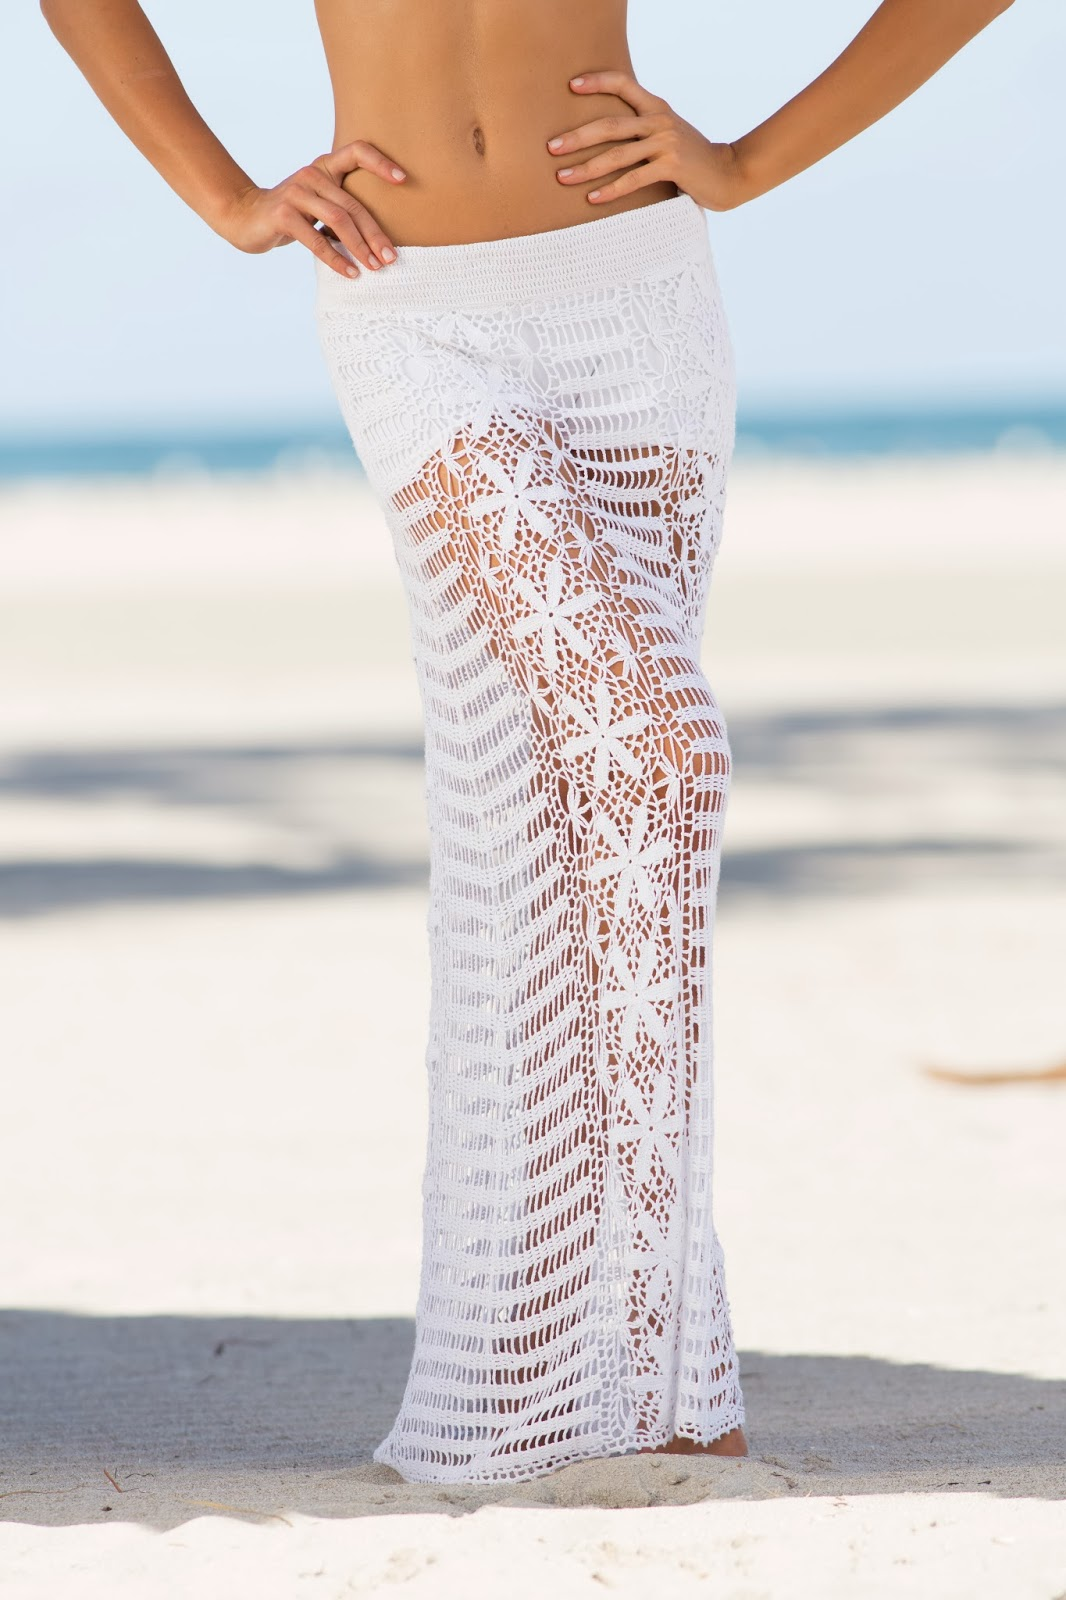 https://www.cameonouveau.com/Letarte-Crochet-Maxi-Skirt-White-p/n_letar_020.htm